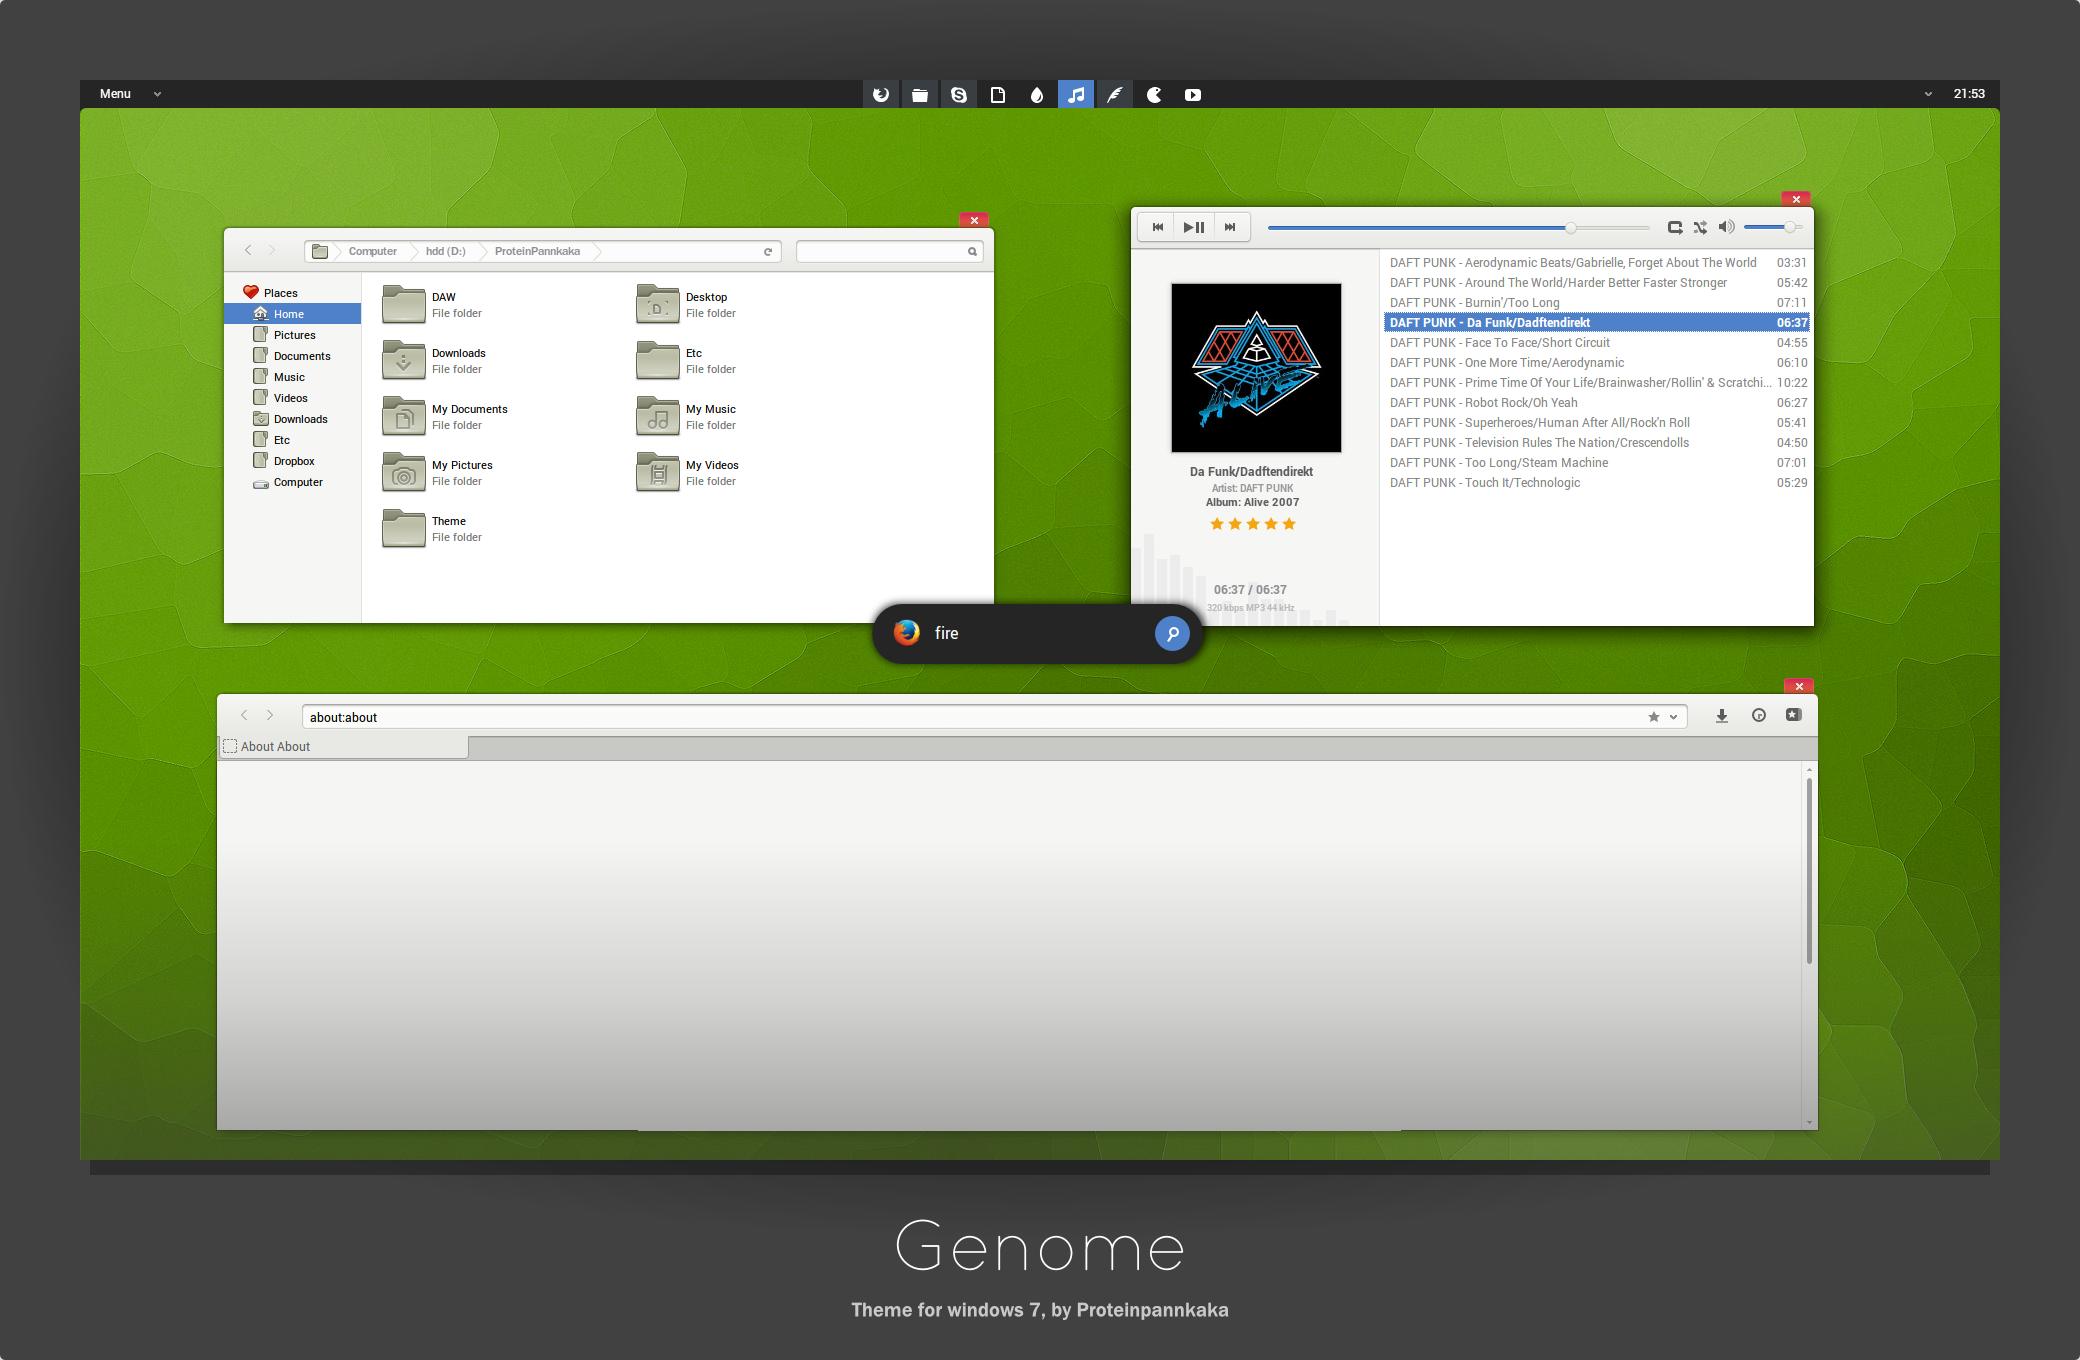 Genome by ProteinPannkaka